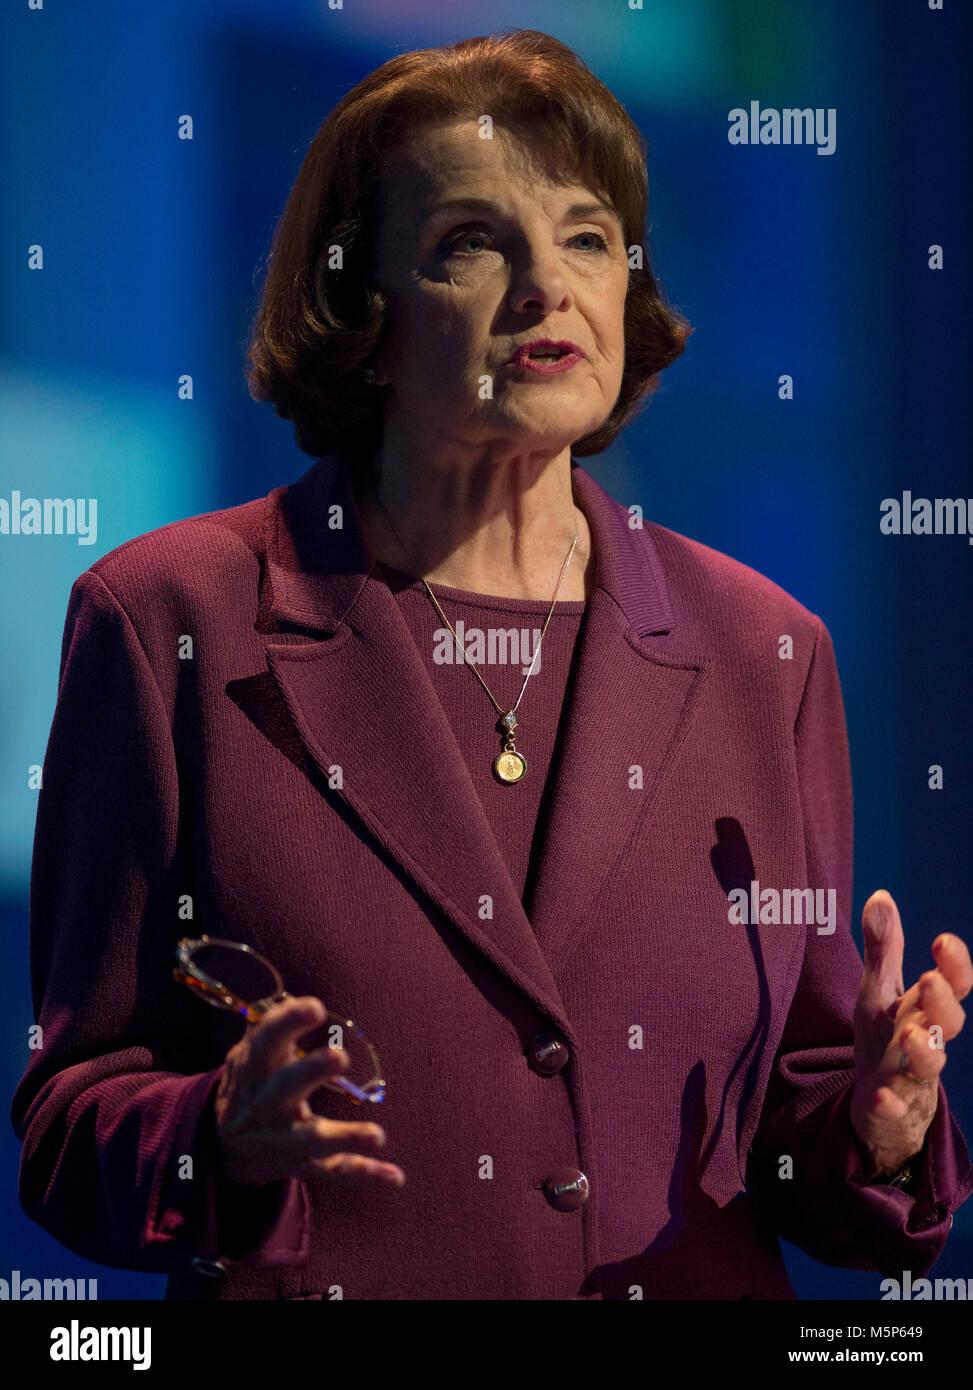 San Diego, California, USA. 24th Feb, 2018. U.S. Senator DIANNE FEINSTEIN (D-CA) addresses the 2018 California Democrats - Stock Image